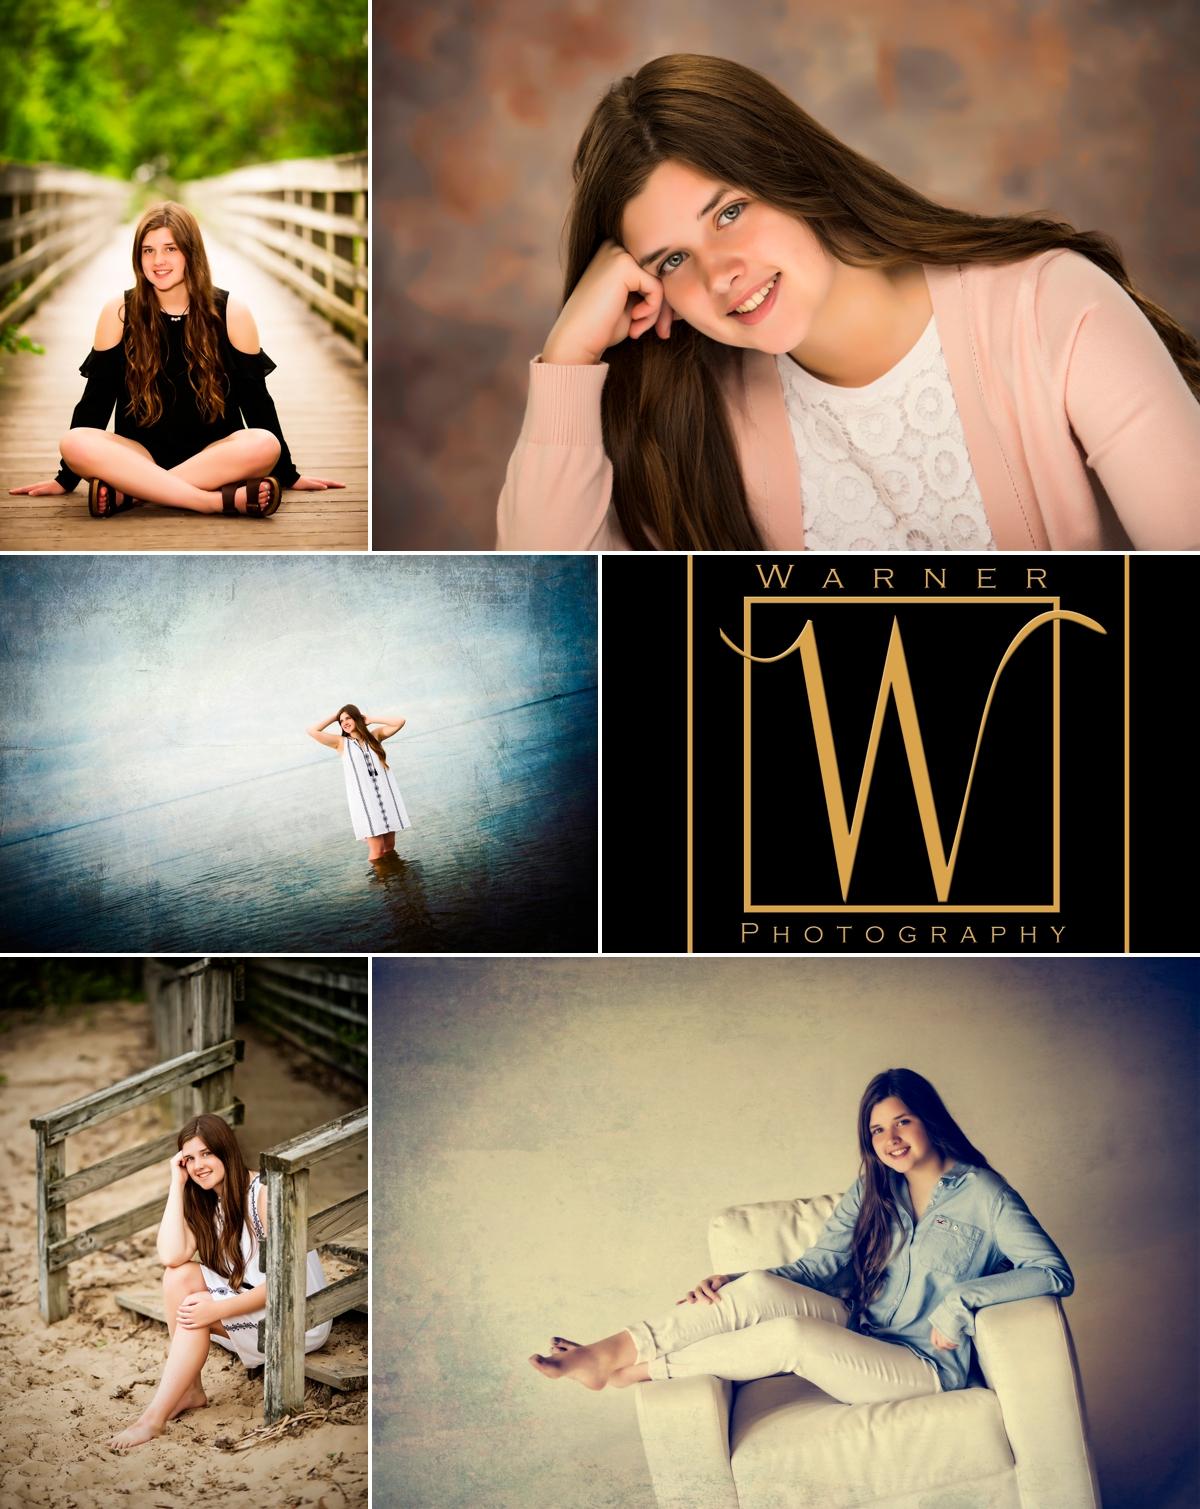 Sarah Senior Collage photos by Warner Photography in Midland Michigan